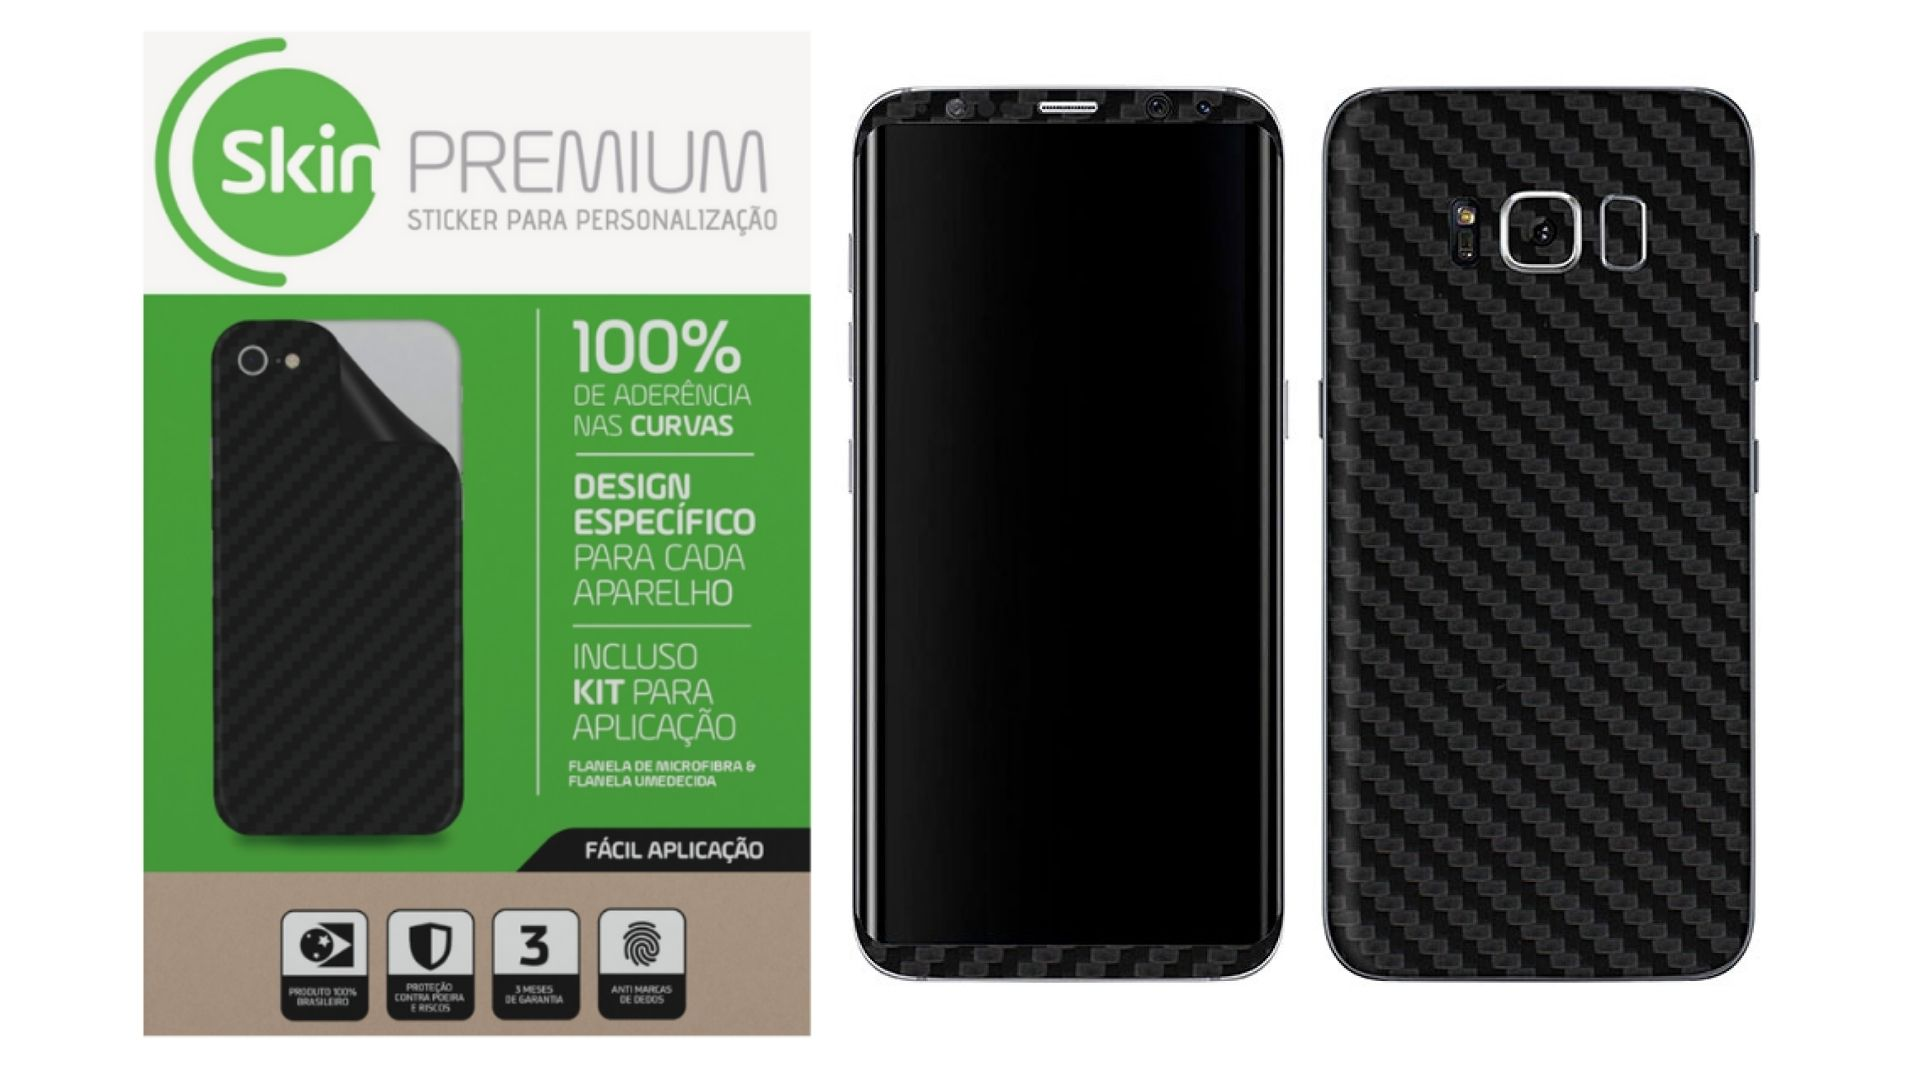 Skin Premium Fibra de Carbono Verso e Laterais para Samsung Galaxy S8